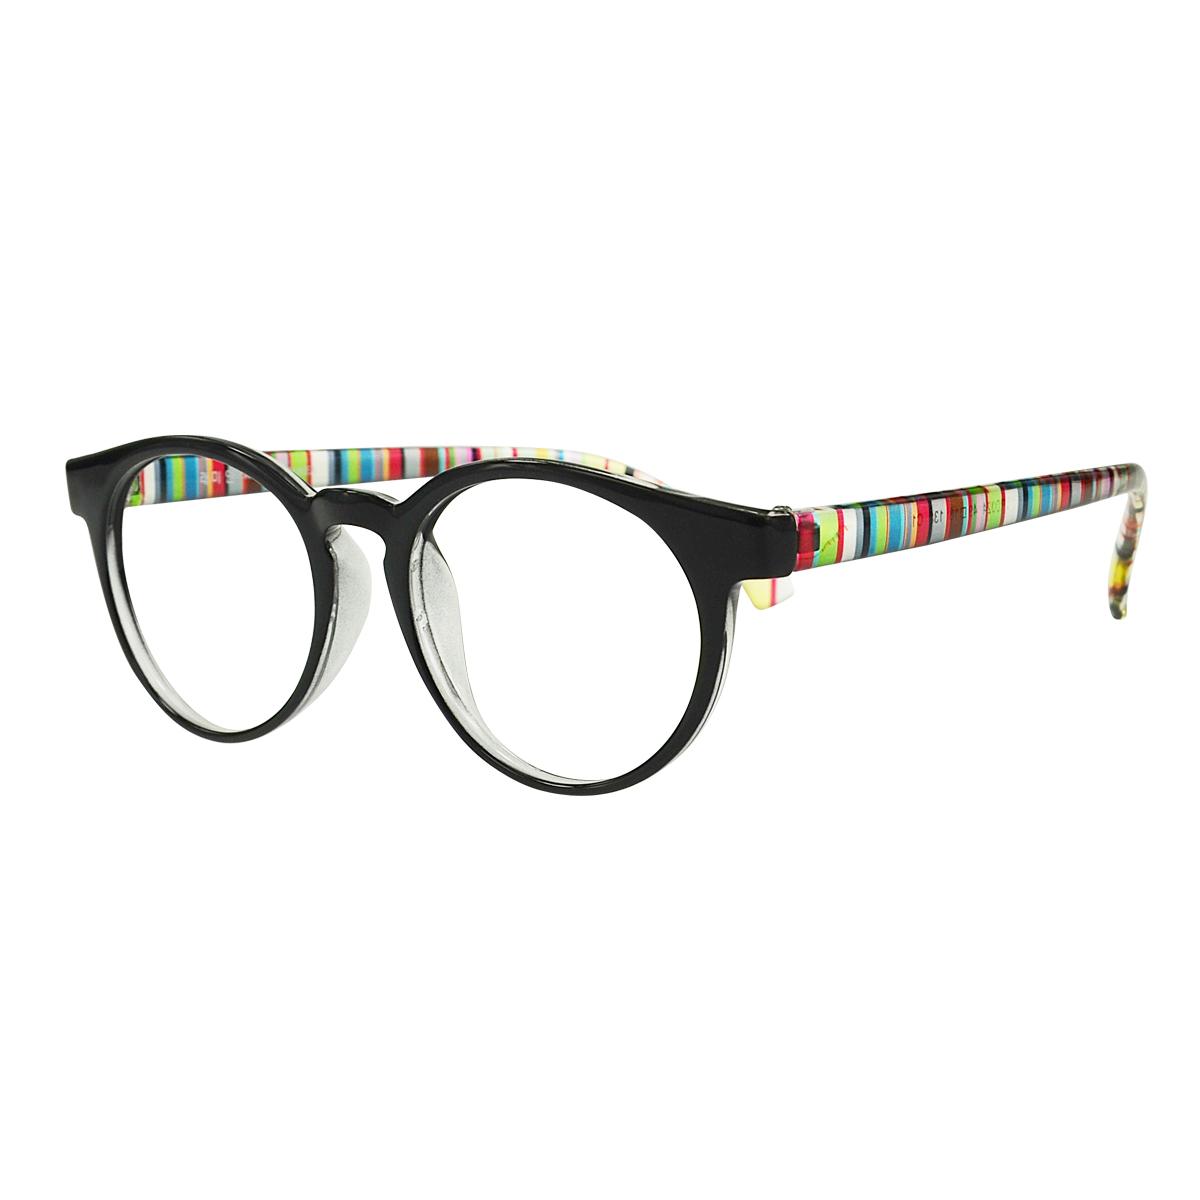 be4c10e1e7 Get Quotations · Visionary authentic korean couple lightweight tr90 frame  myopia glasses men and women retro small round black